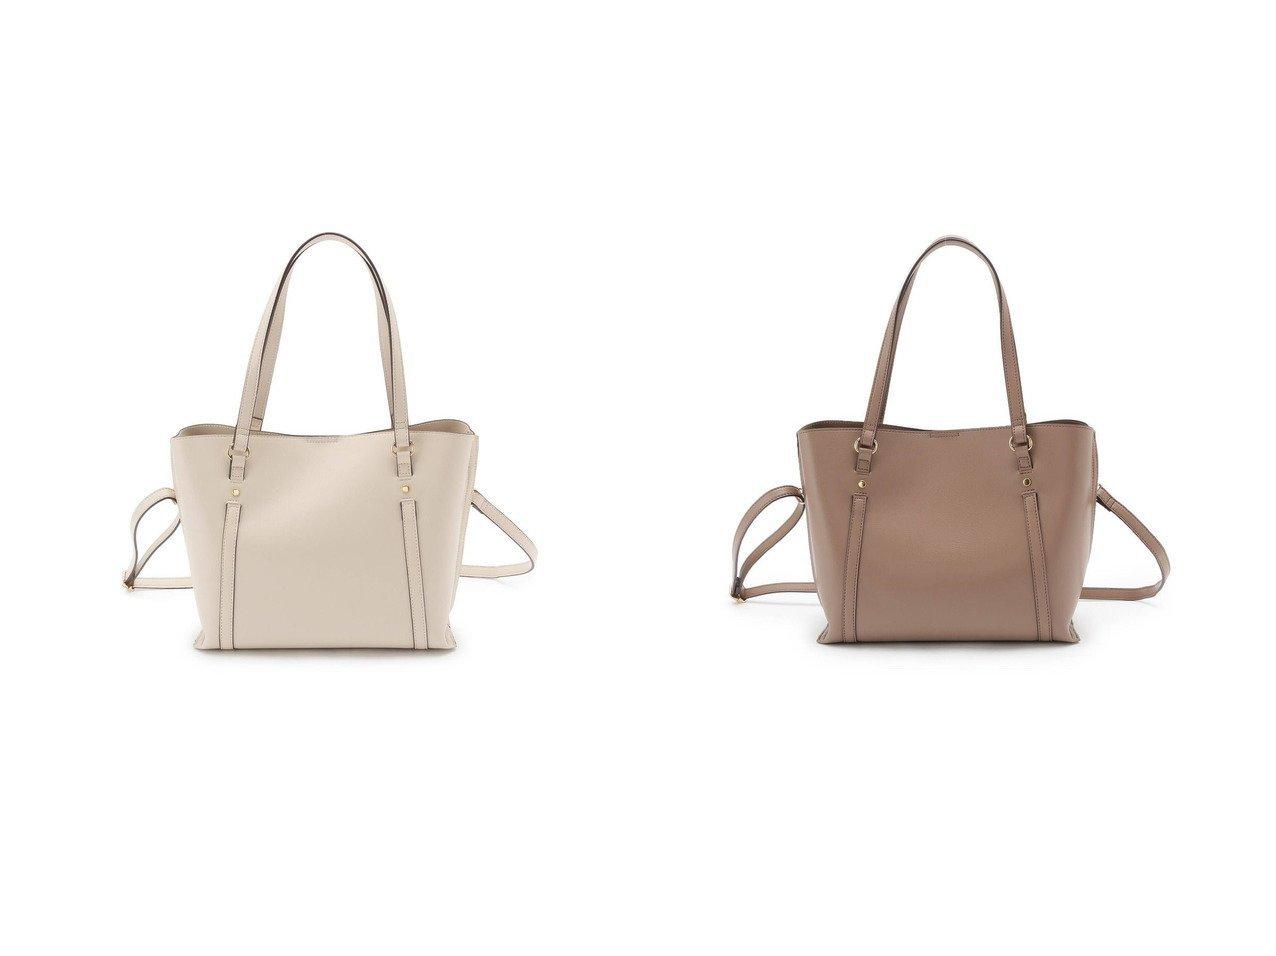 【pink adobe/ピンクアドベ】の【2WAY】【軽量】ベーシックトートバッグ バッグ・鞄のおすすめ!人気、トレンド・レディースファッションの通販 おすすめで人気の流行・トレンド、ファッションの通販商品 メンズファッション・キッズファッション・インテリア・家具・レディースファッション・服の通販 founy(ファニー) https://founy.com/ ファッション Fashion レディースファッション WOMEN バッグ Bag 2021年 2021 2021 春夏 S/S SS Spring/Summer 2021 S/S 春夏 SS Spring/Summer ショルダー ベーシック 春 Spring 軽量  ID:crp329100000016346